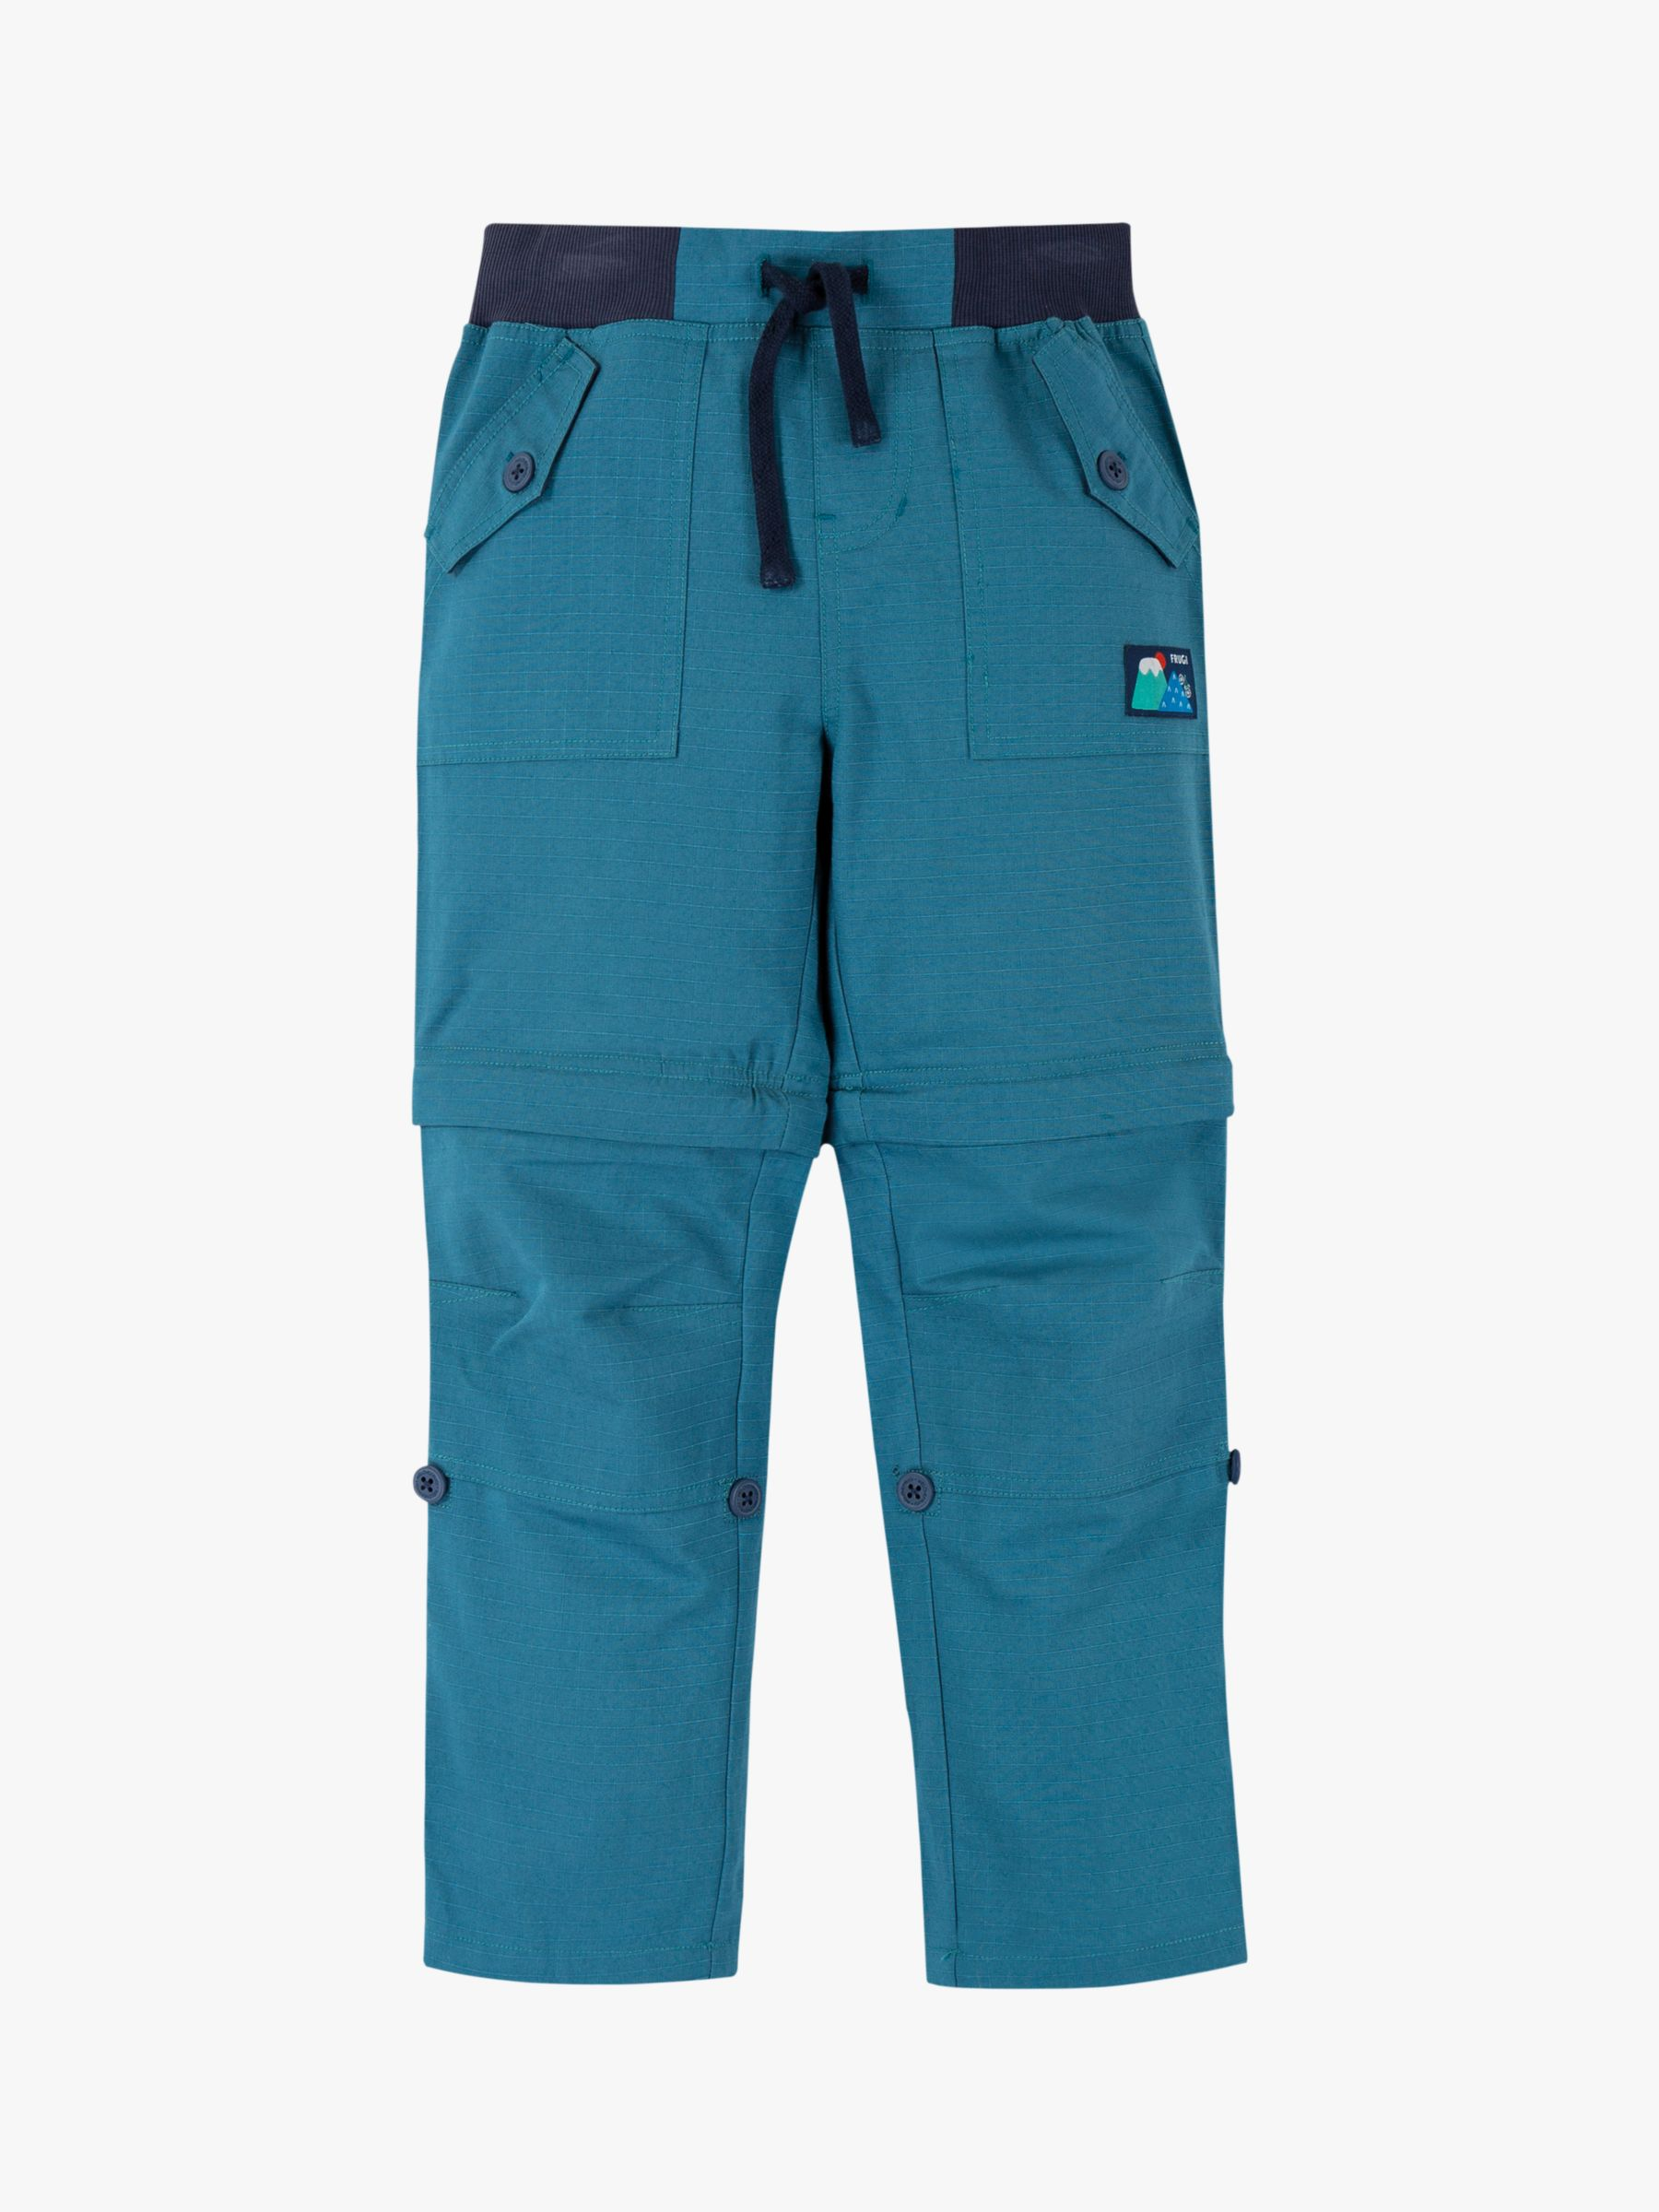 Frugi Frugi Children's GOTS Organic Cotton Rip Stop Zip Off Trousers, Blue